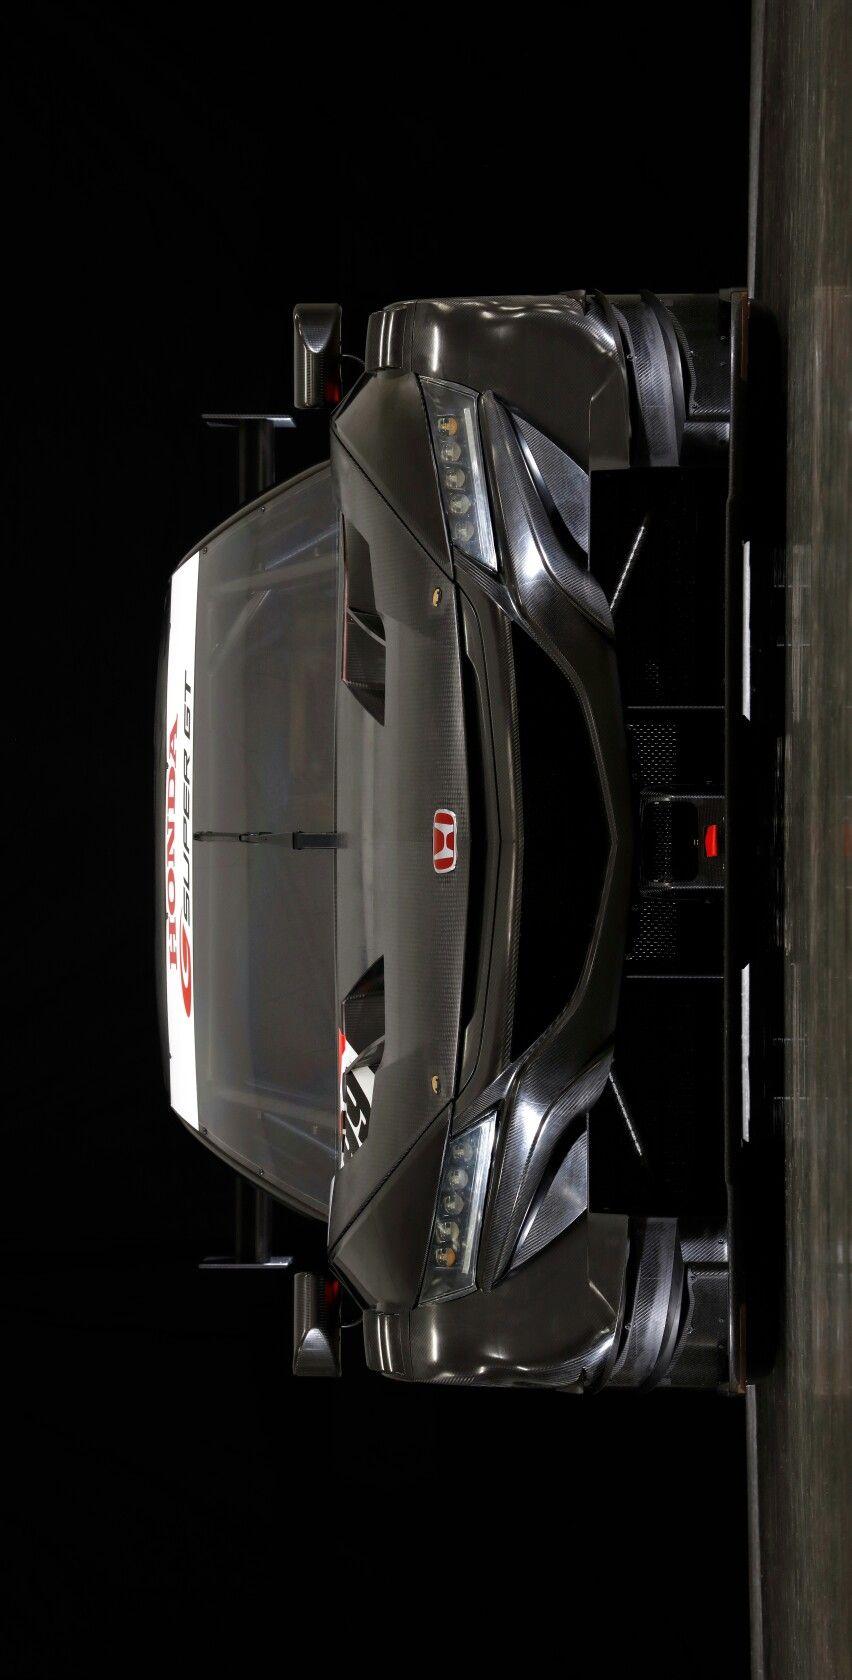 2020 Honda Nsx Gt Gt500 Super Gt Series Image Enhanced By Keely Vonmonski